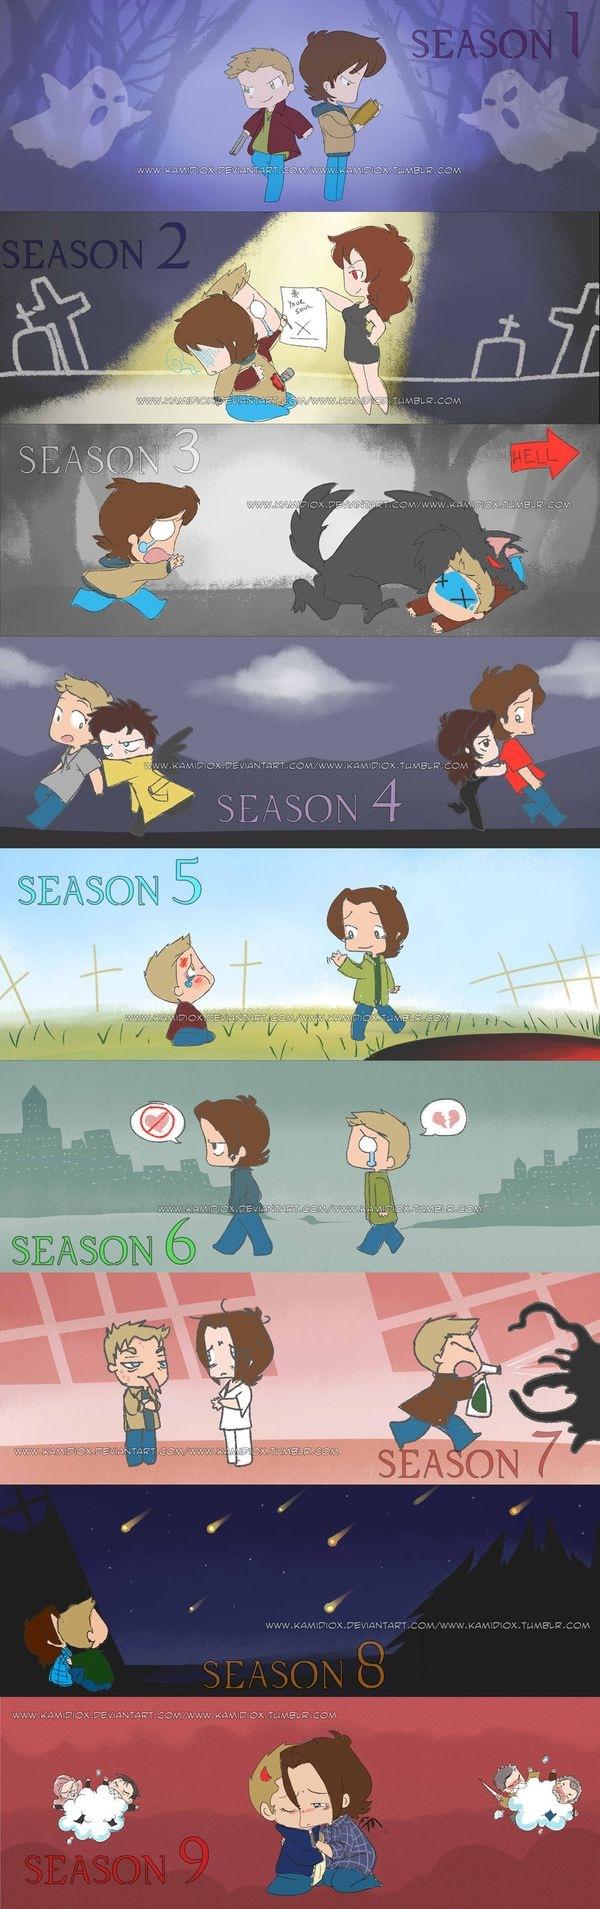 Brief summery of each season